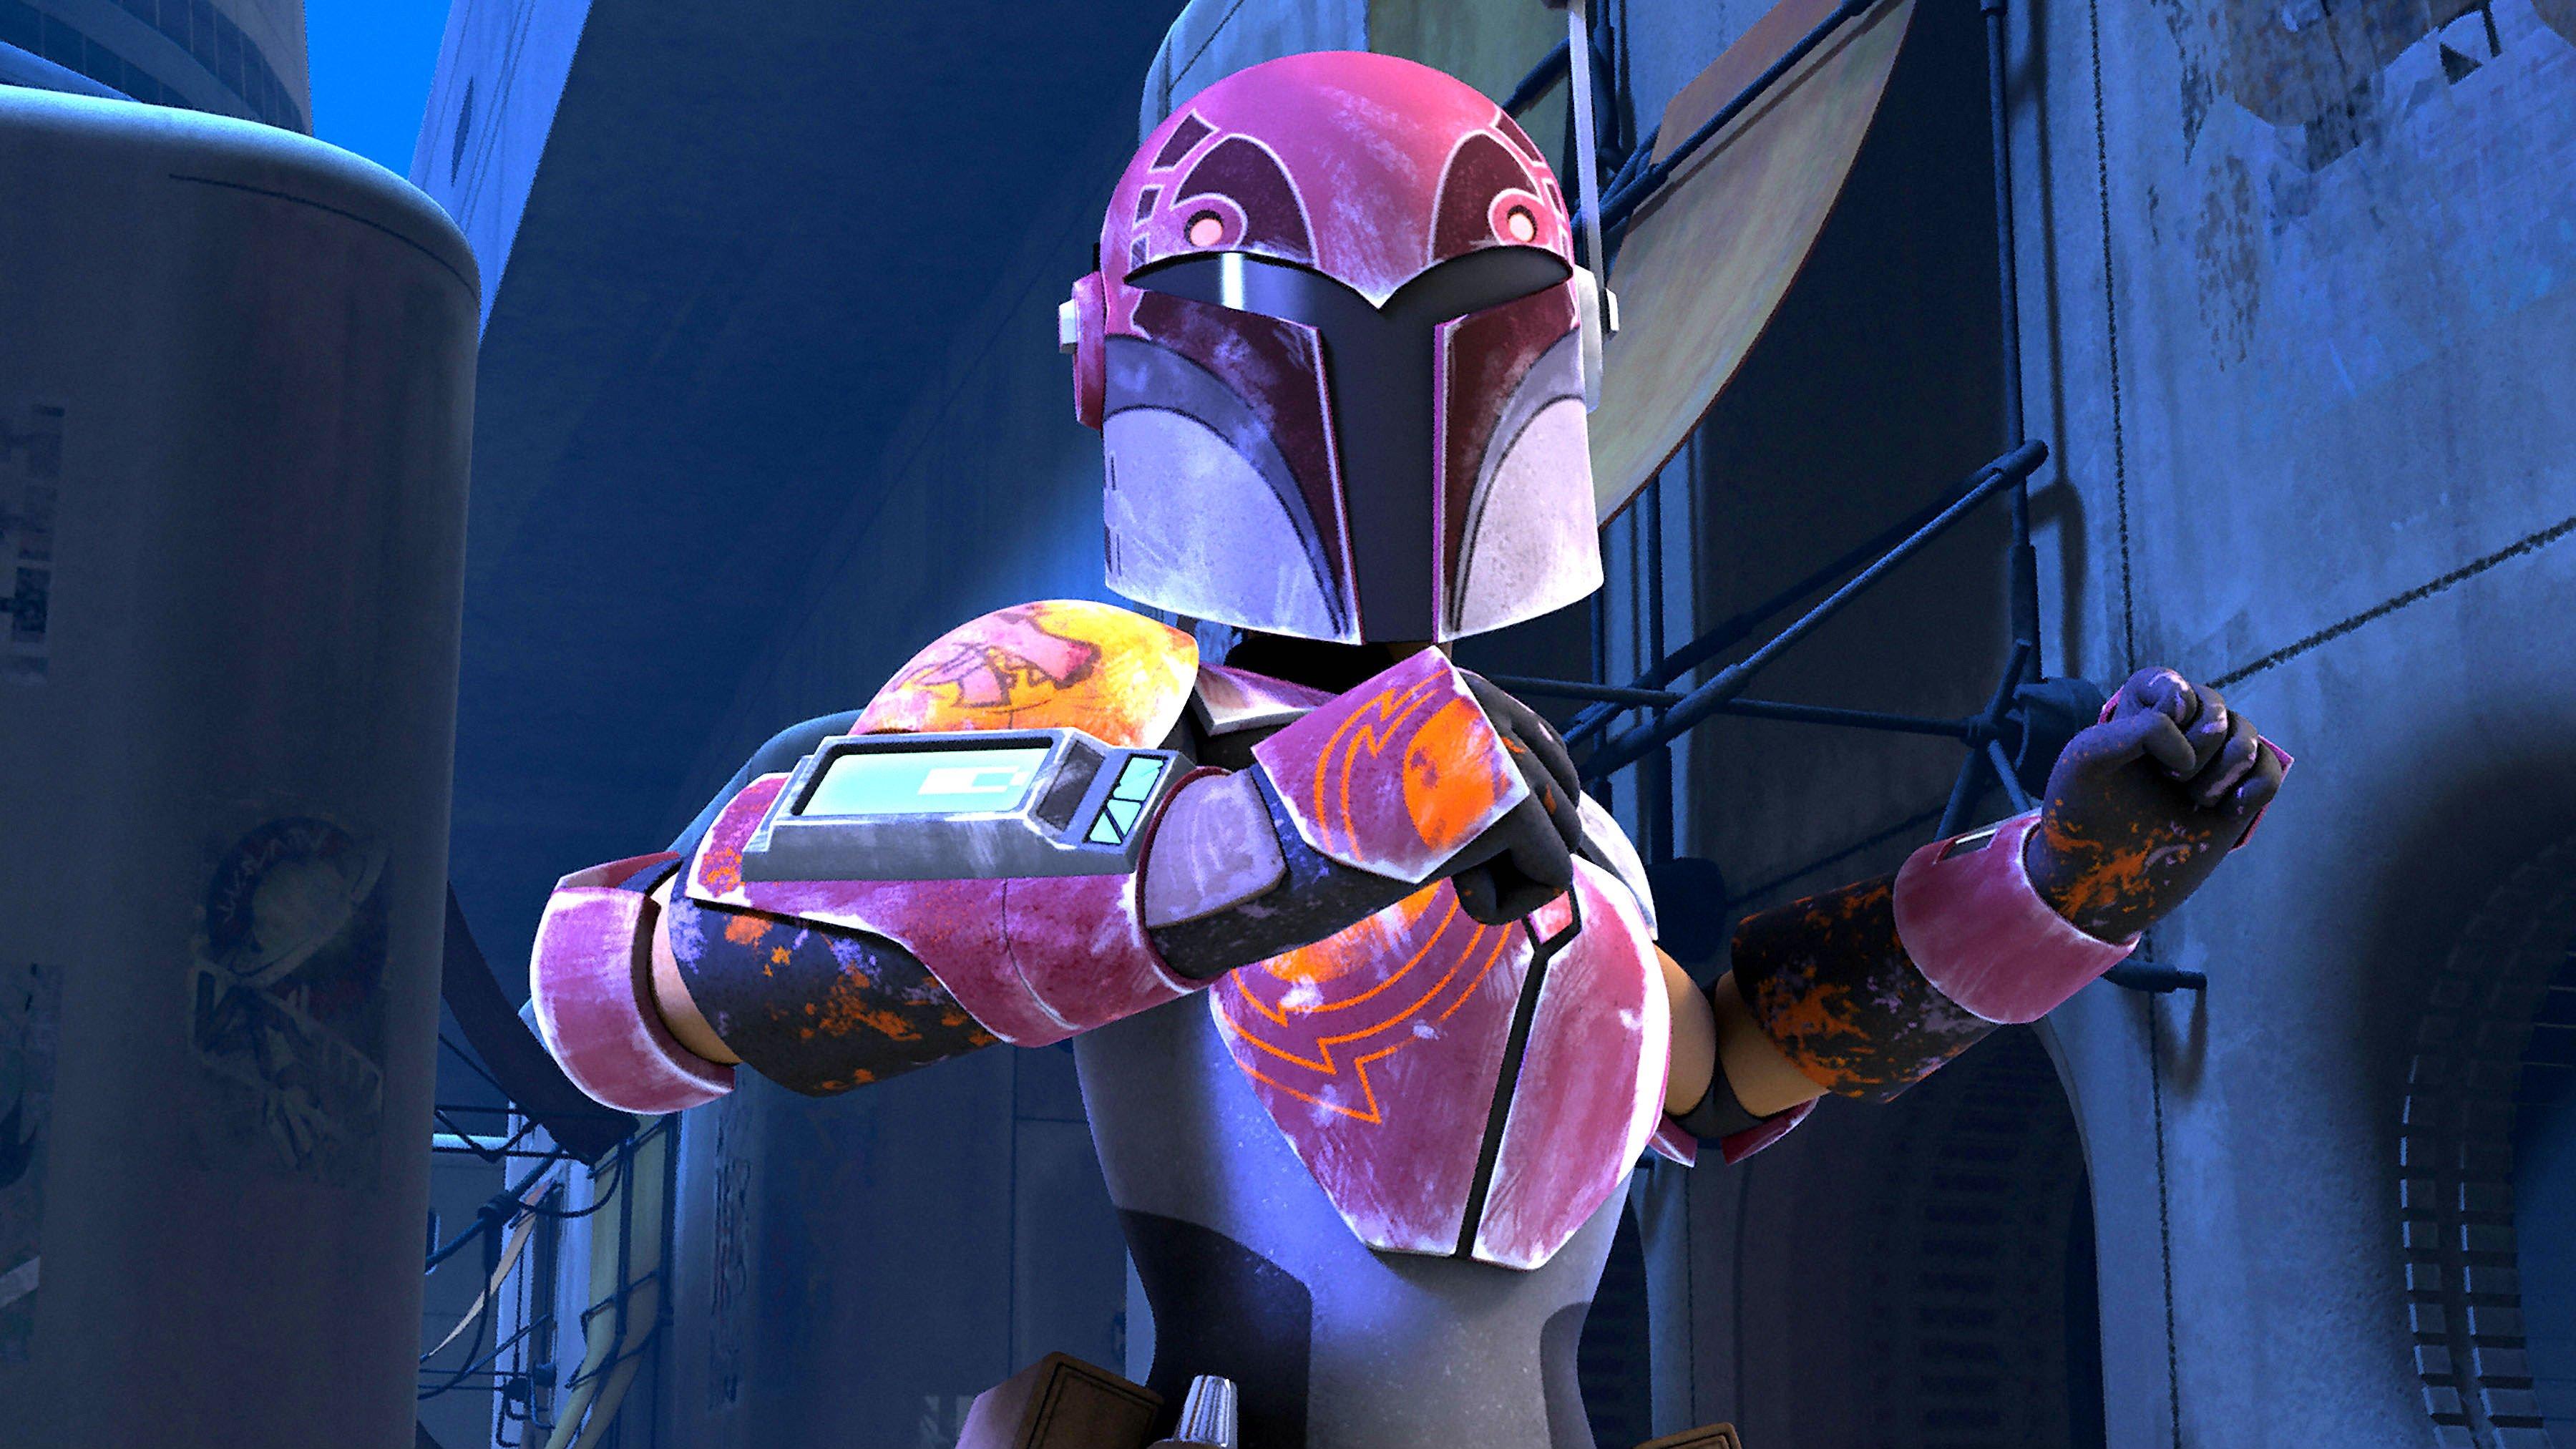 Star Wars Rebels Animated Series Sci Fi Disney Action Adventure